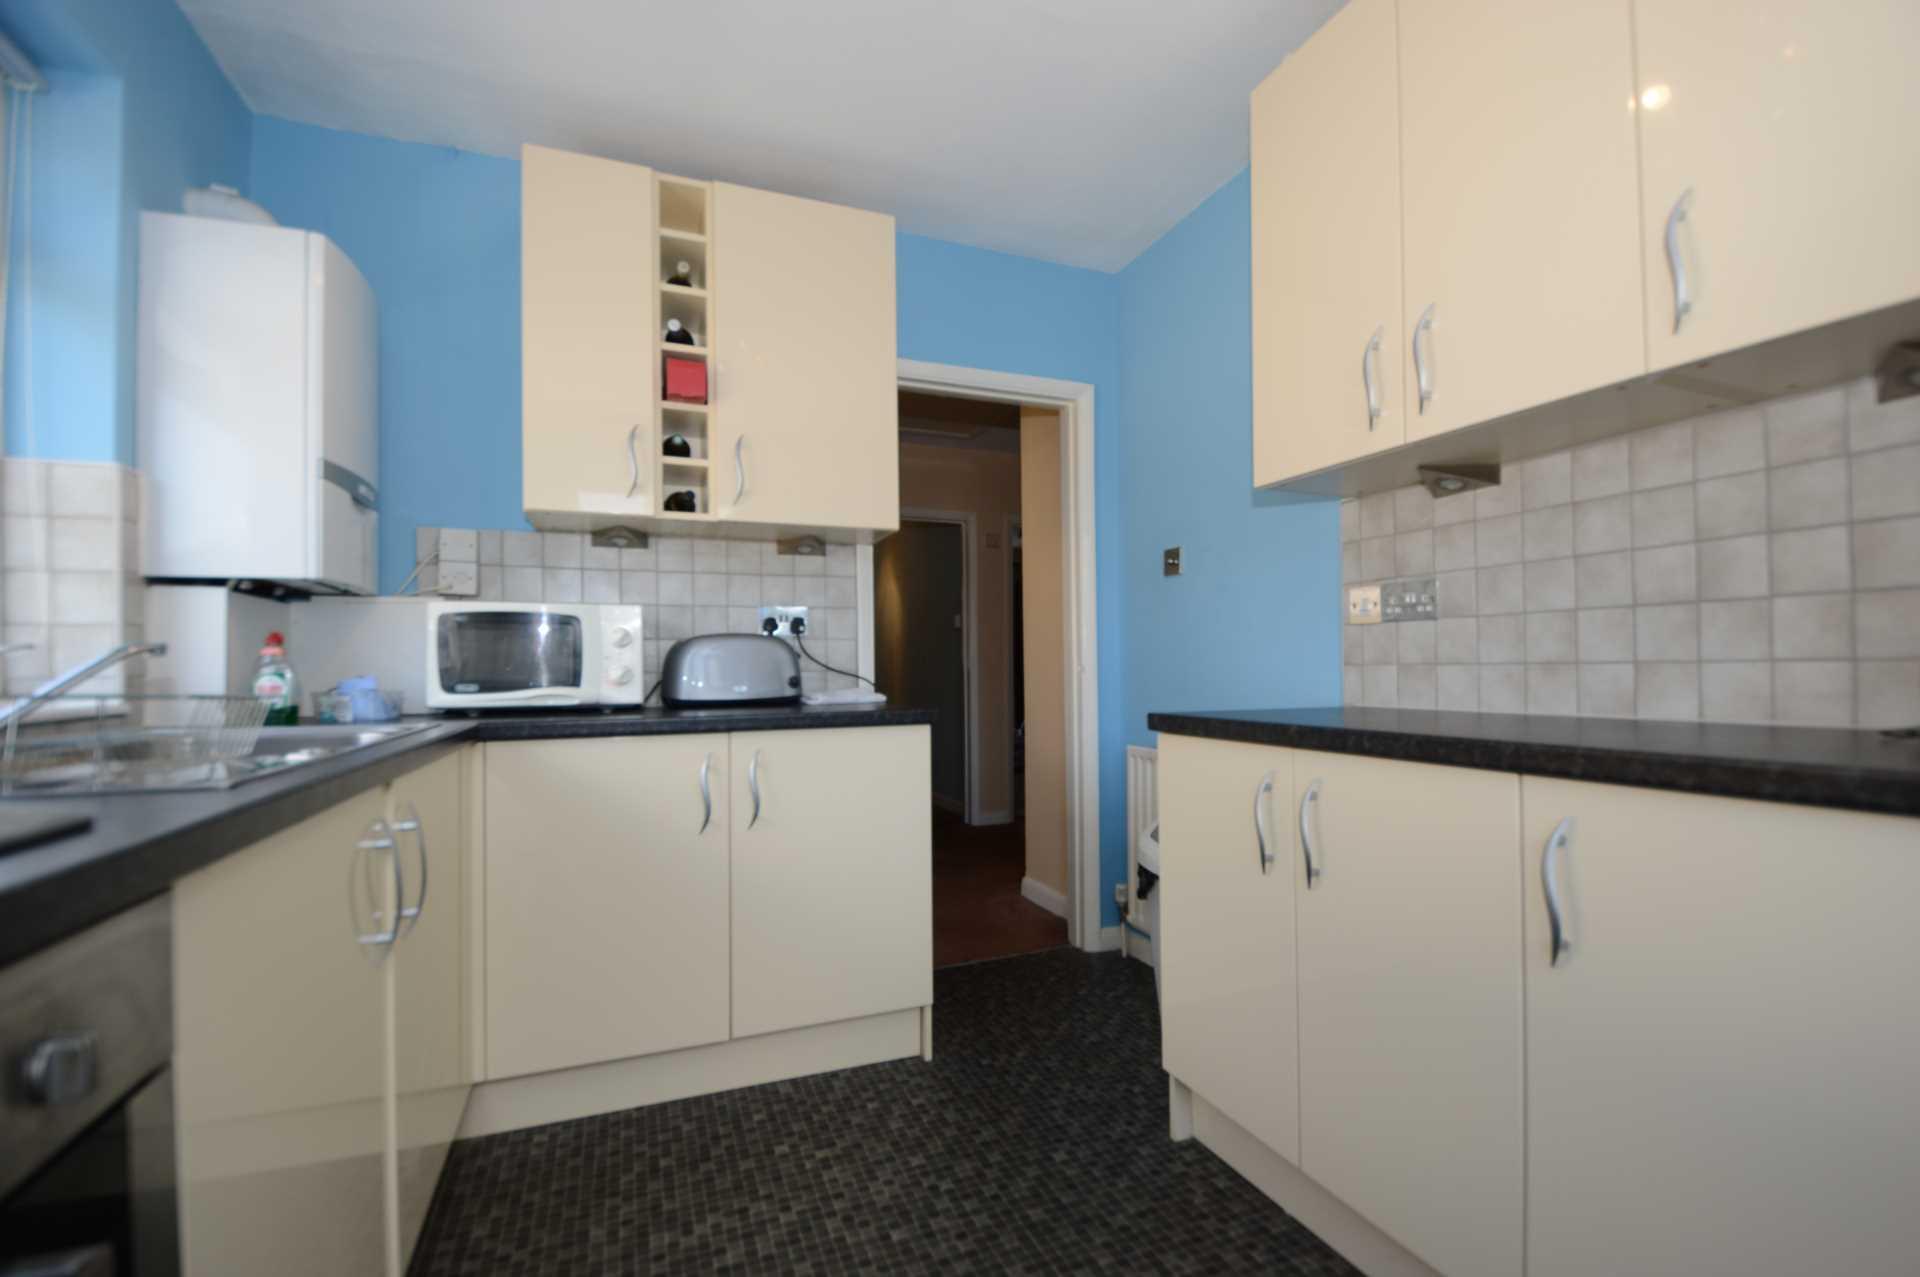 2 bedroom flat for sale, Beaconsfield Road, London, N11 3AA ...